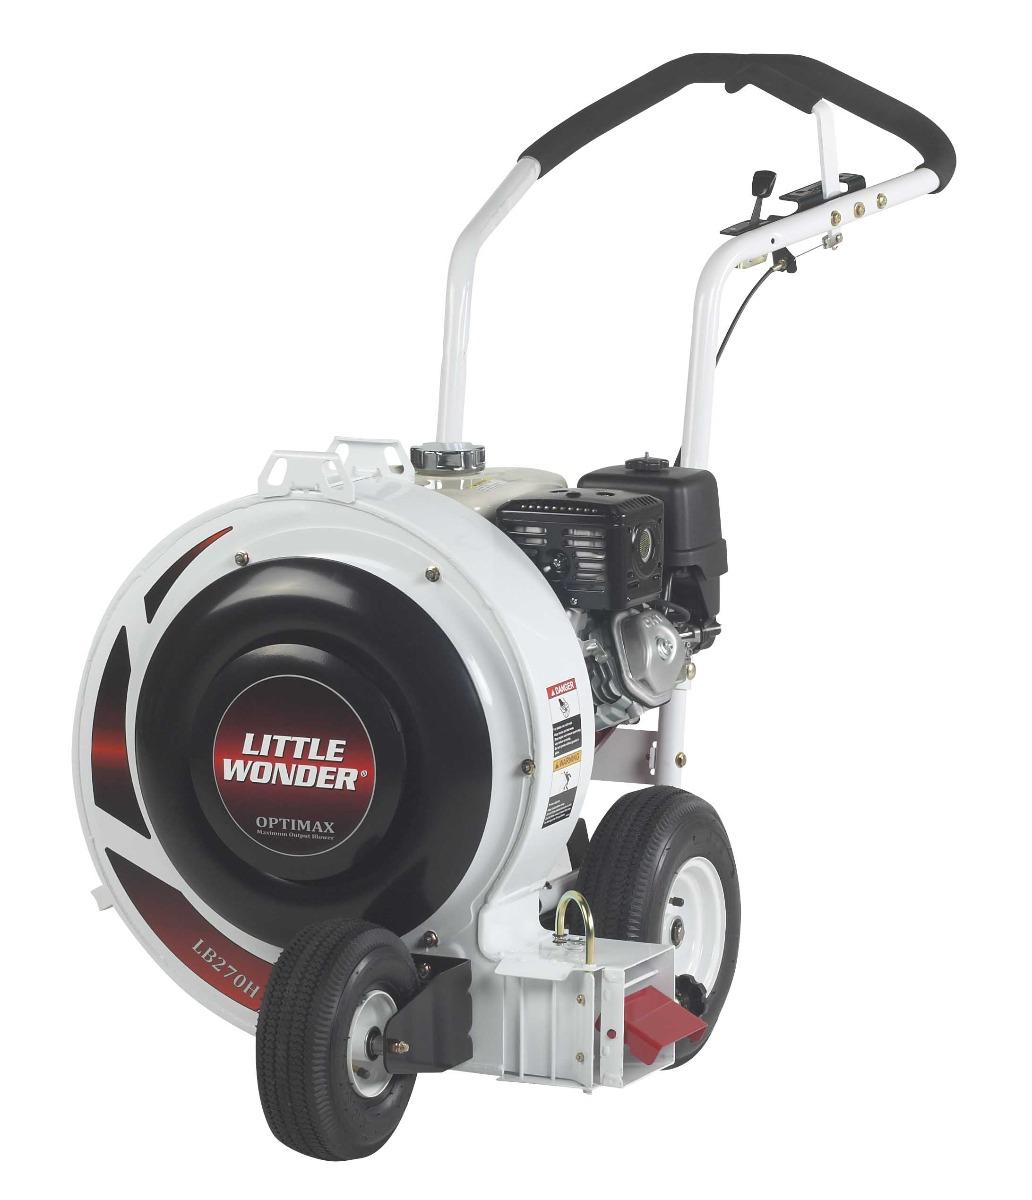 Little Wonder LB270H Push Blower Walkbehind Optimax